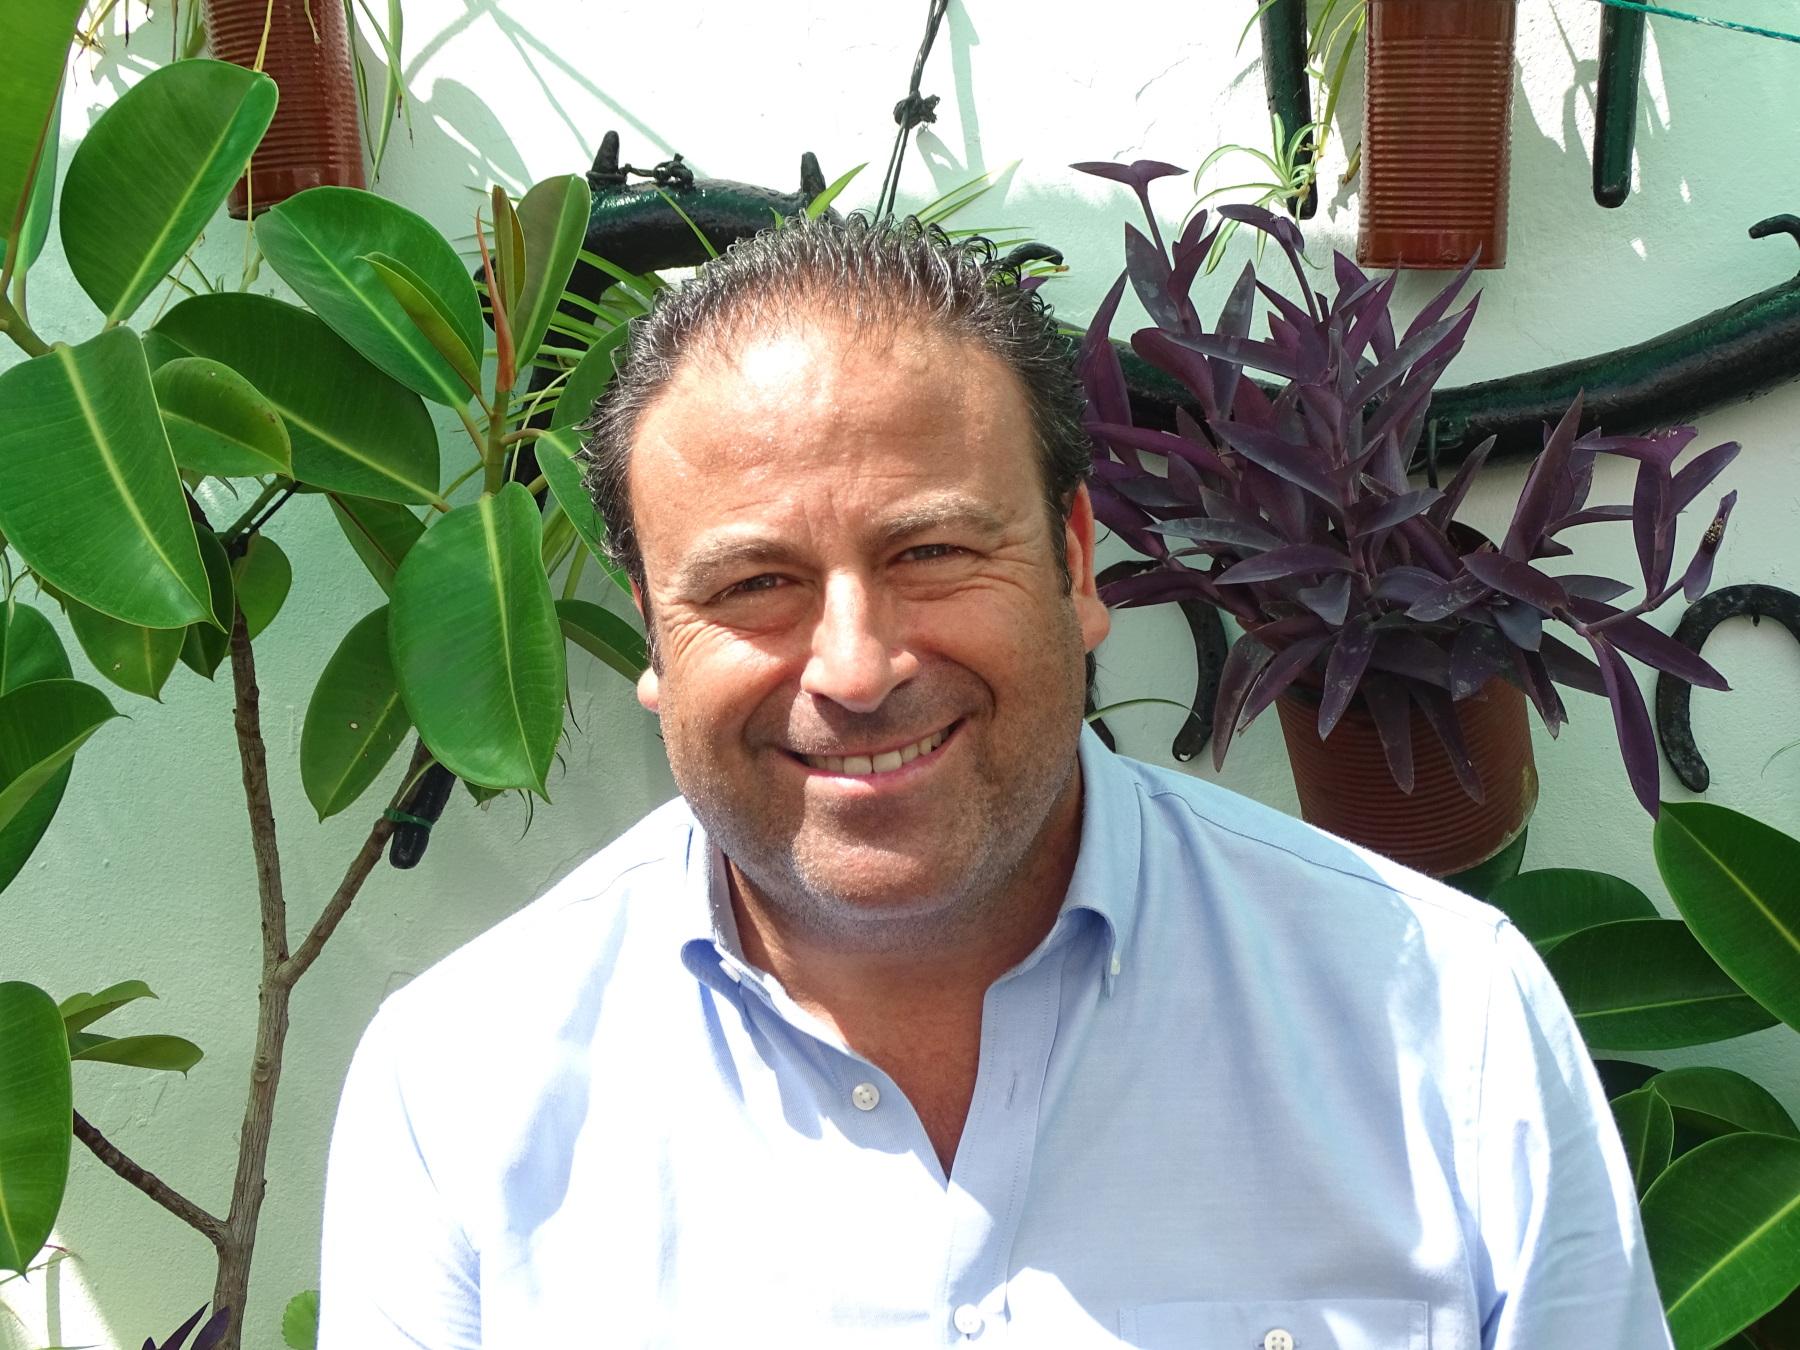 Entrevista a Pablo Oñós, pregonero de Valme de 2019